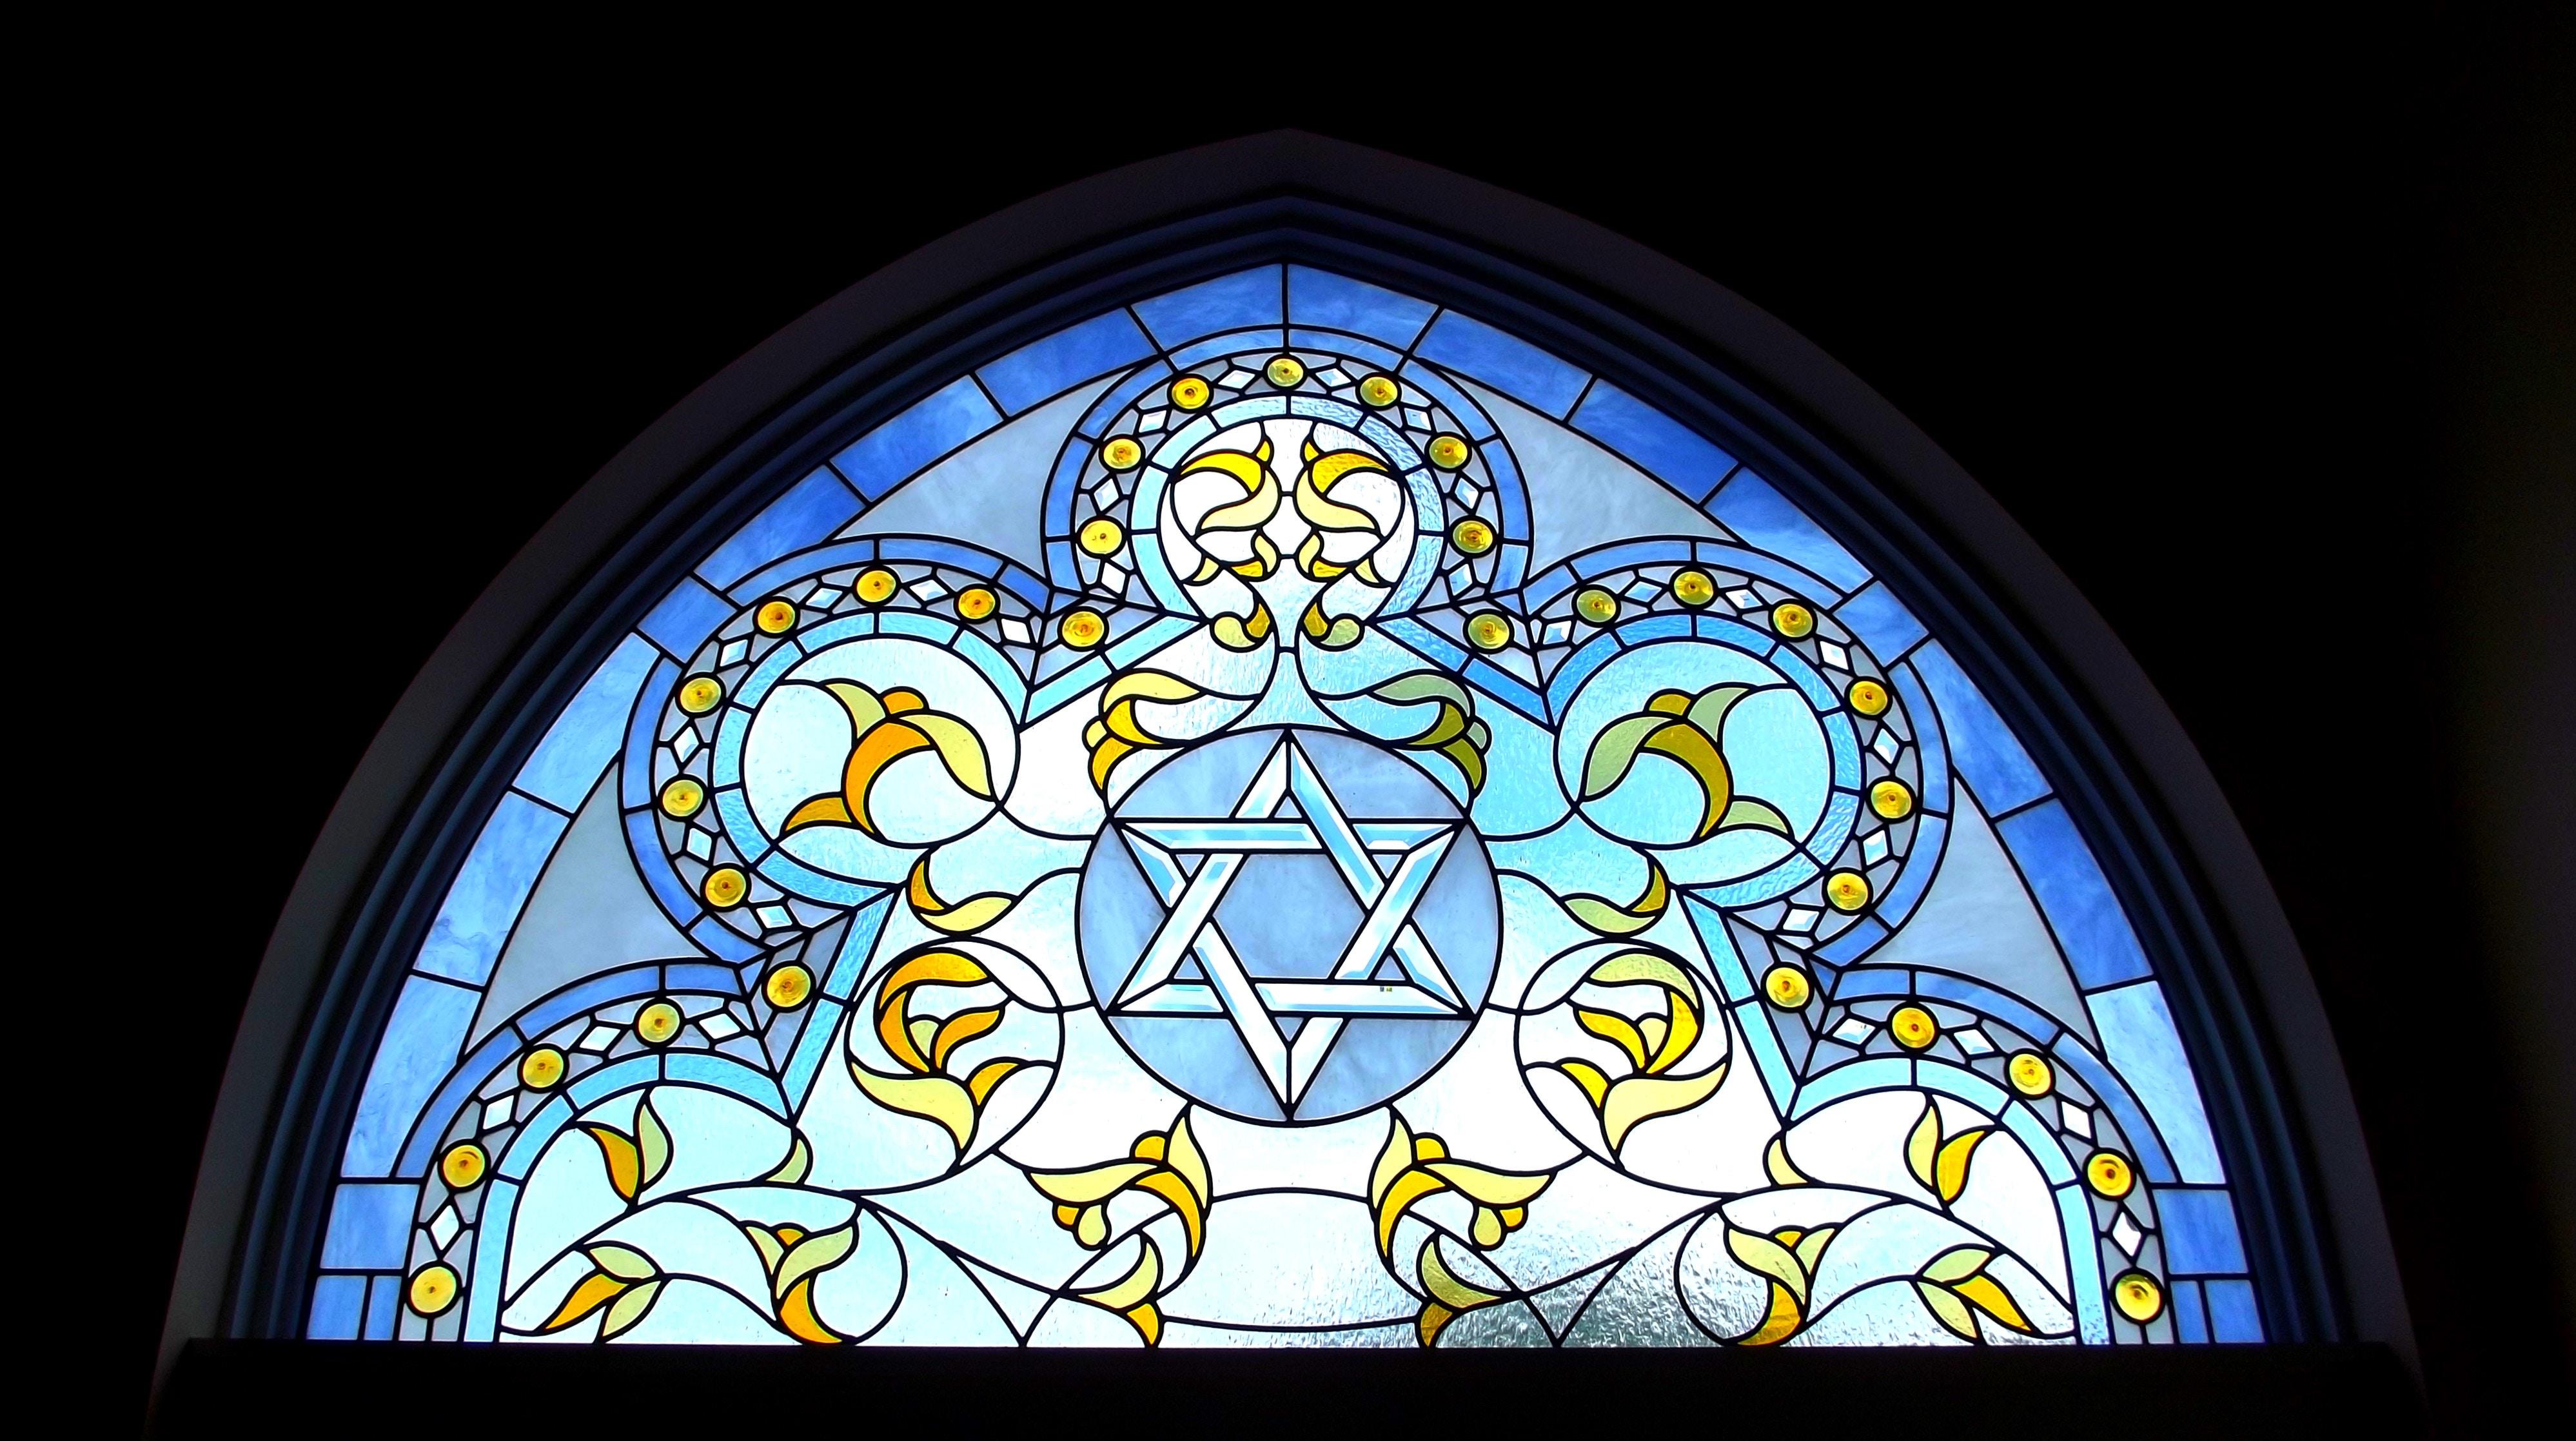 yosef pregadio 1092968 unsplash - Mourner's Kaddish